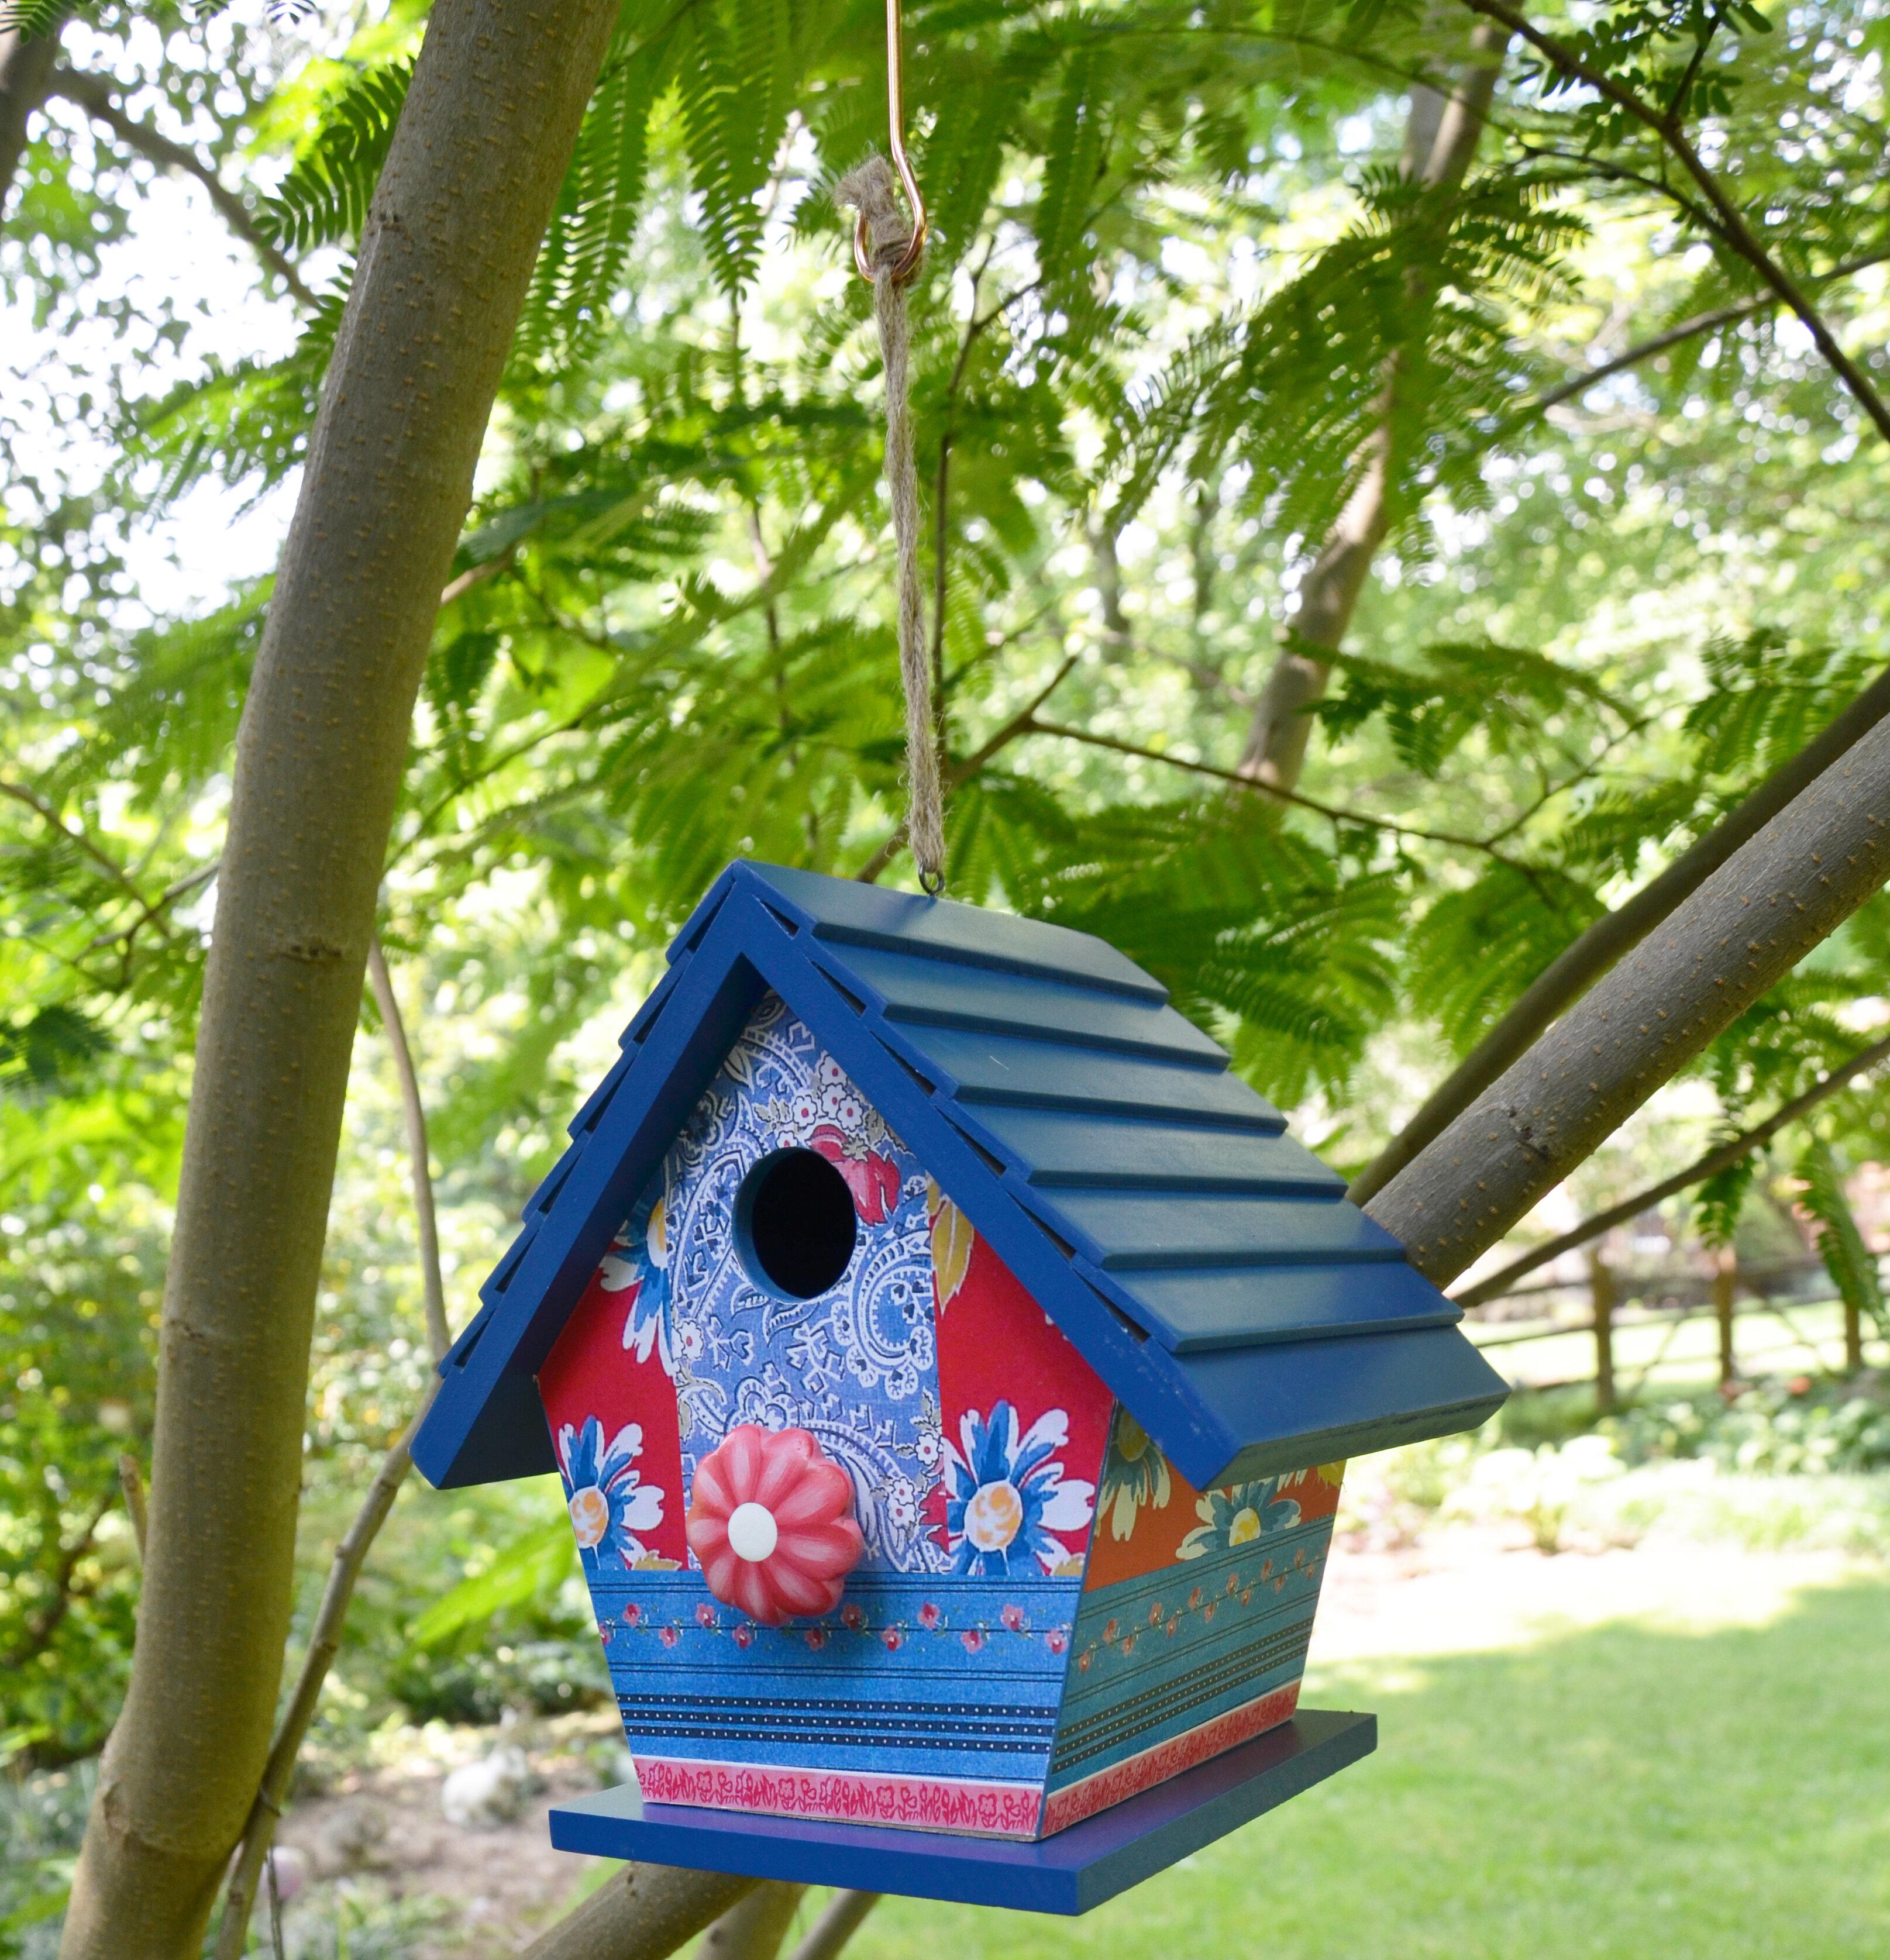 Rcs Gifts Patchwork 8 In X 8 In X 6 In Birdhouse Wayfair